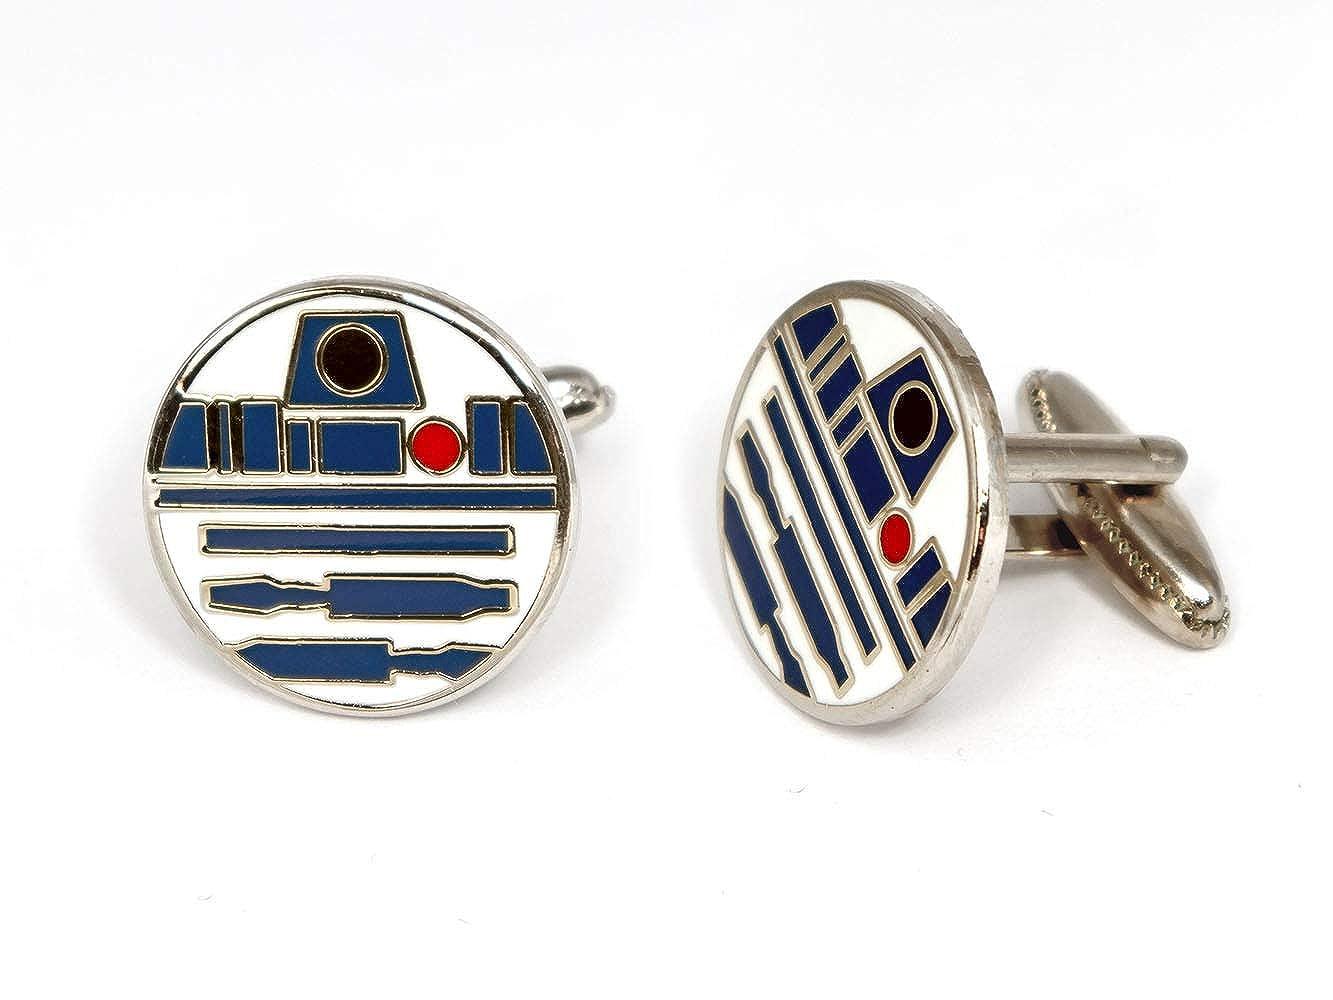 Jedi Tie Tack Jewelry Kylo Stormtrooper Death Star Gift SharedImagination R2D2 Cufflinks Star Wars C3PO Wedding Party Groomsman Gifts Star Wars Cufflinks Star Wars Tie Clip Darth Vader Cuff Links